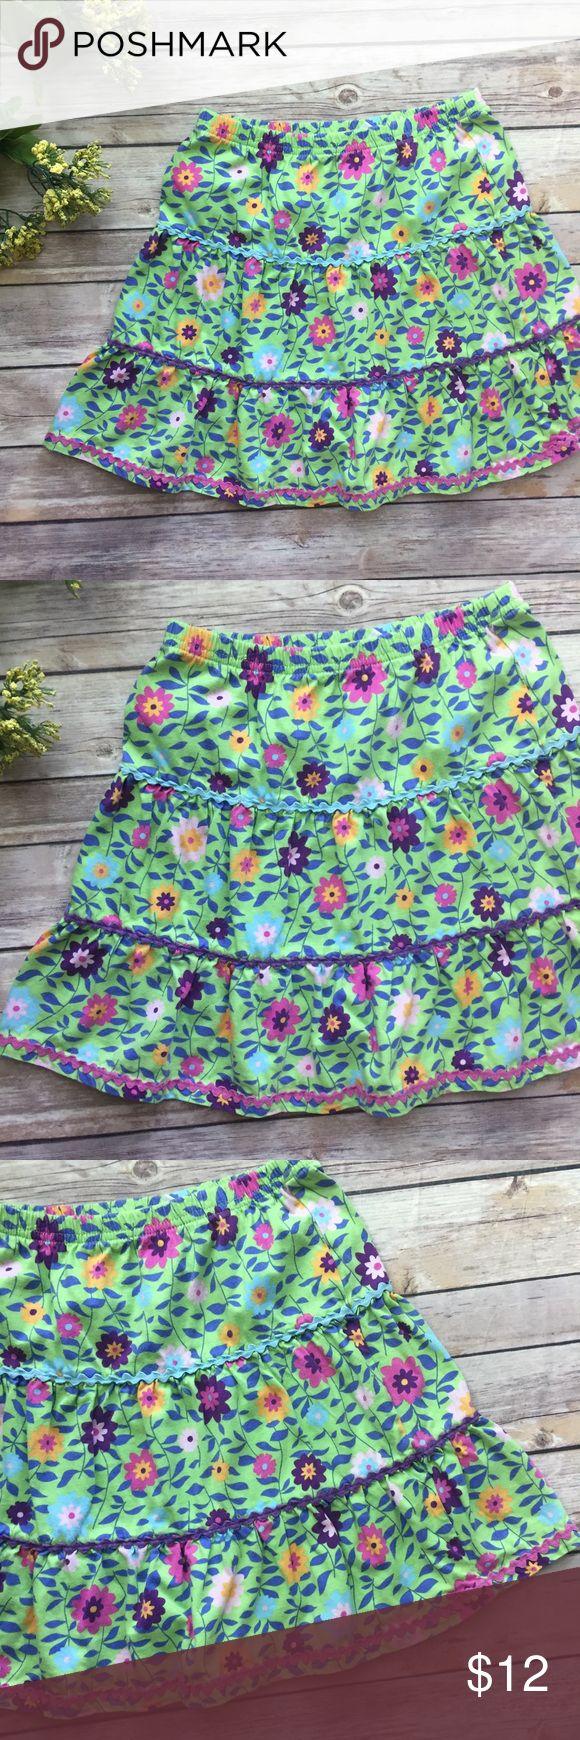 Hanna Andersson Skirt-110 Green floral Hanna Andersson skirt. Size 110 or US 5-6. VGUC. Hanna Andersson Bottoms Skirts